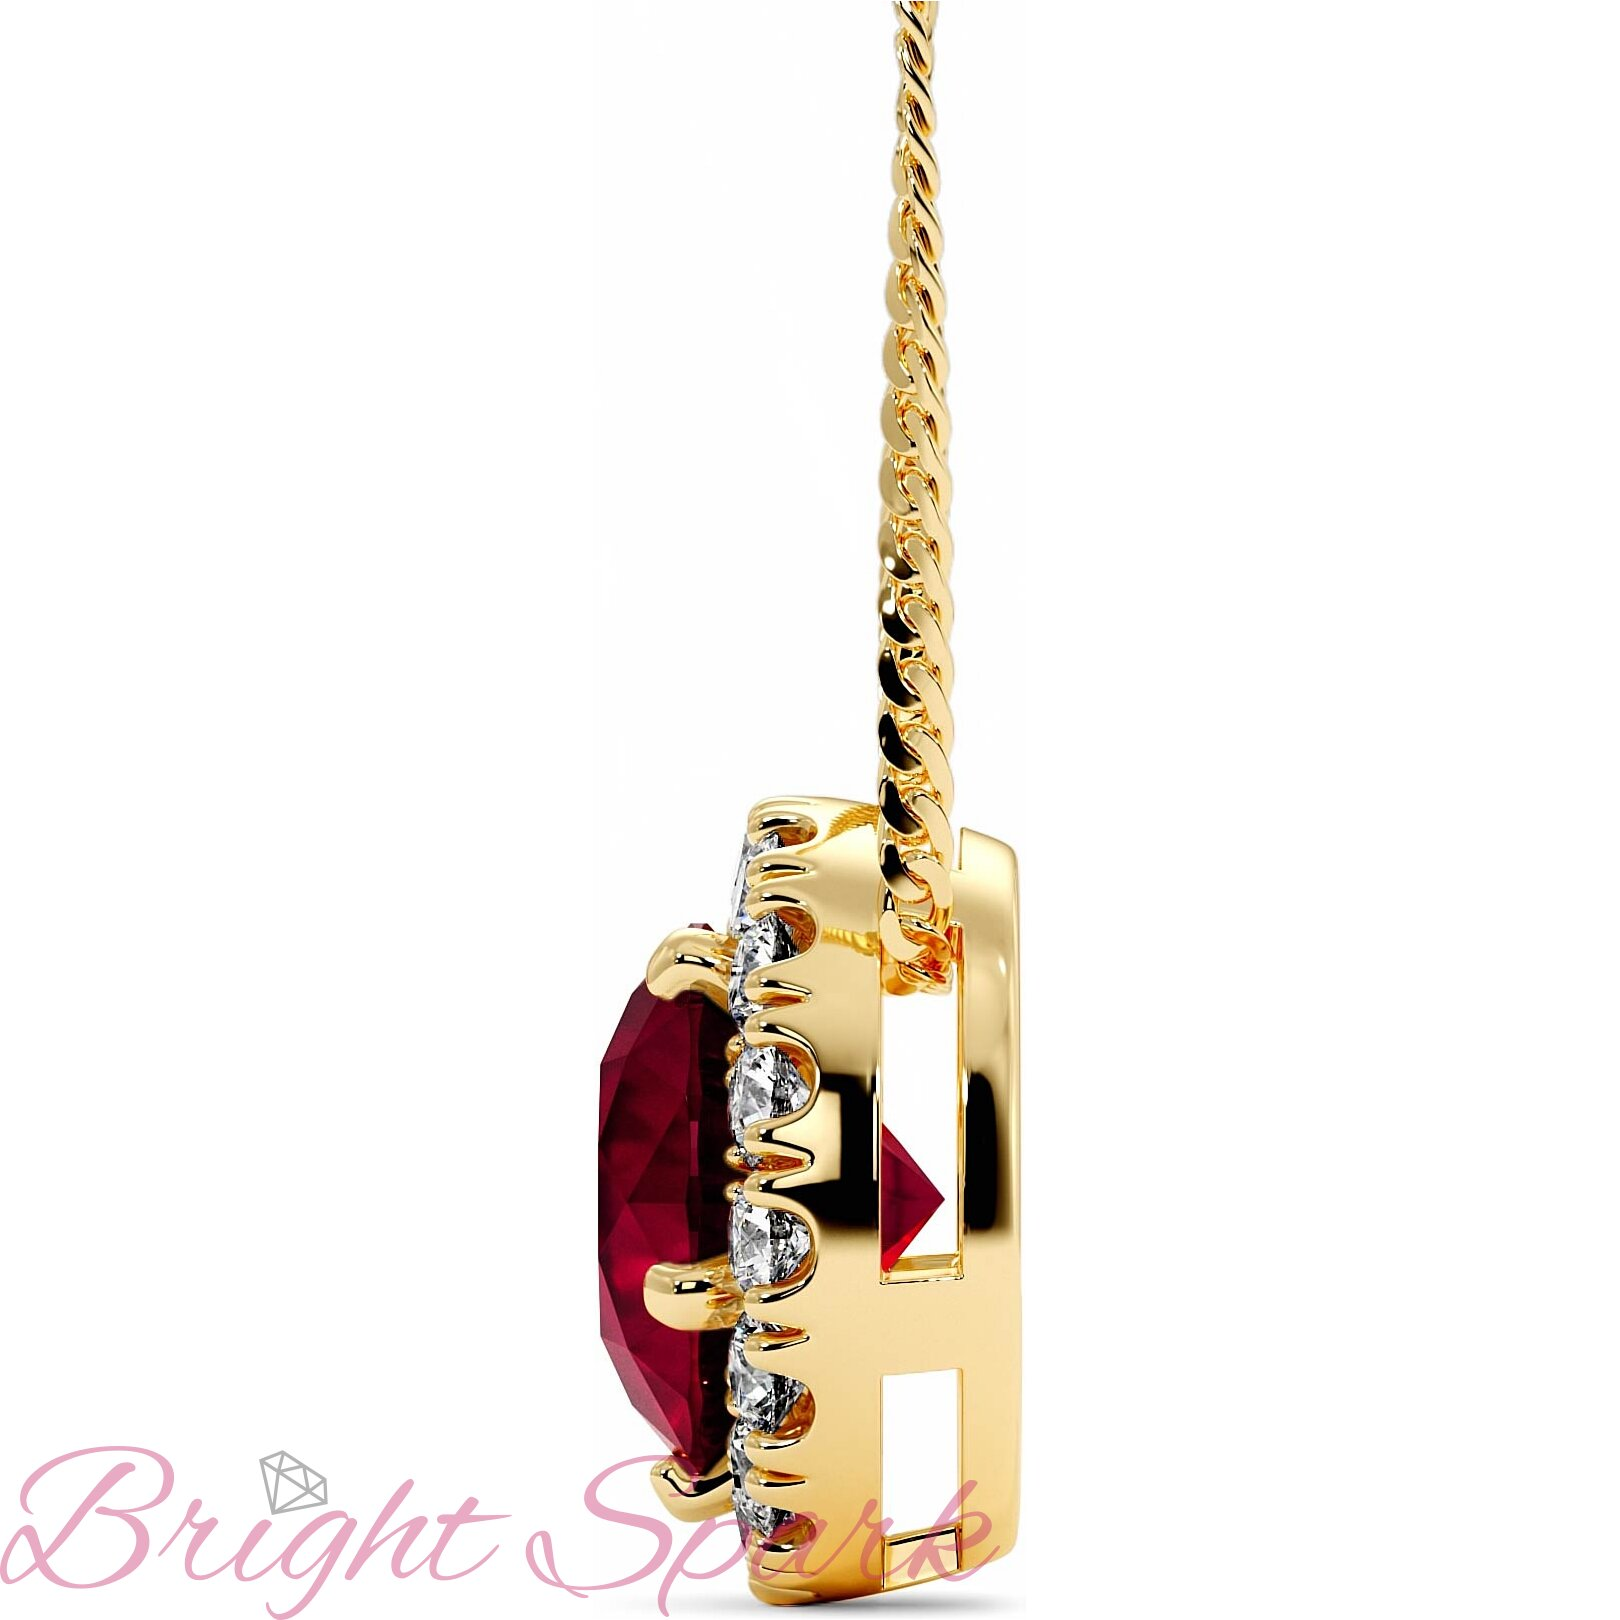 Золотая подвеска-бегунок c рубином в ореоле Amalia на 1,4 карата